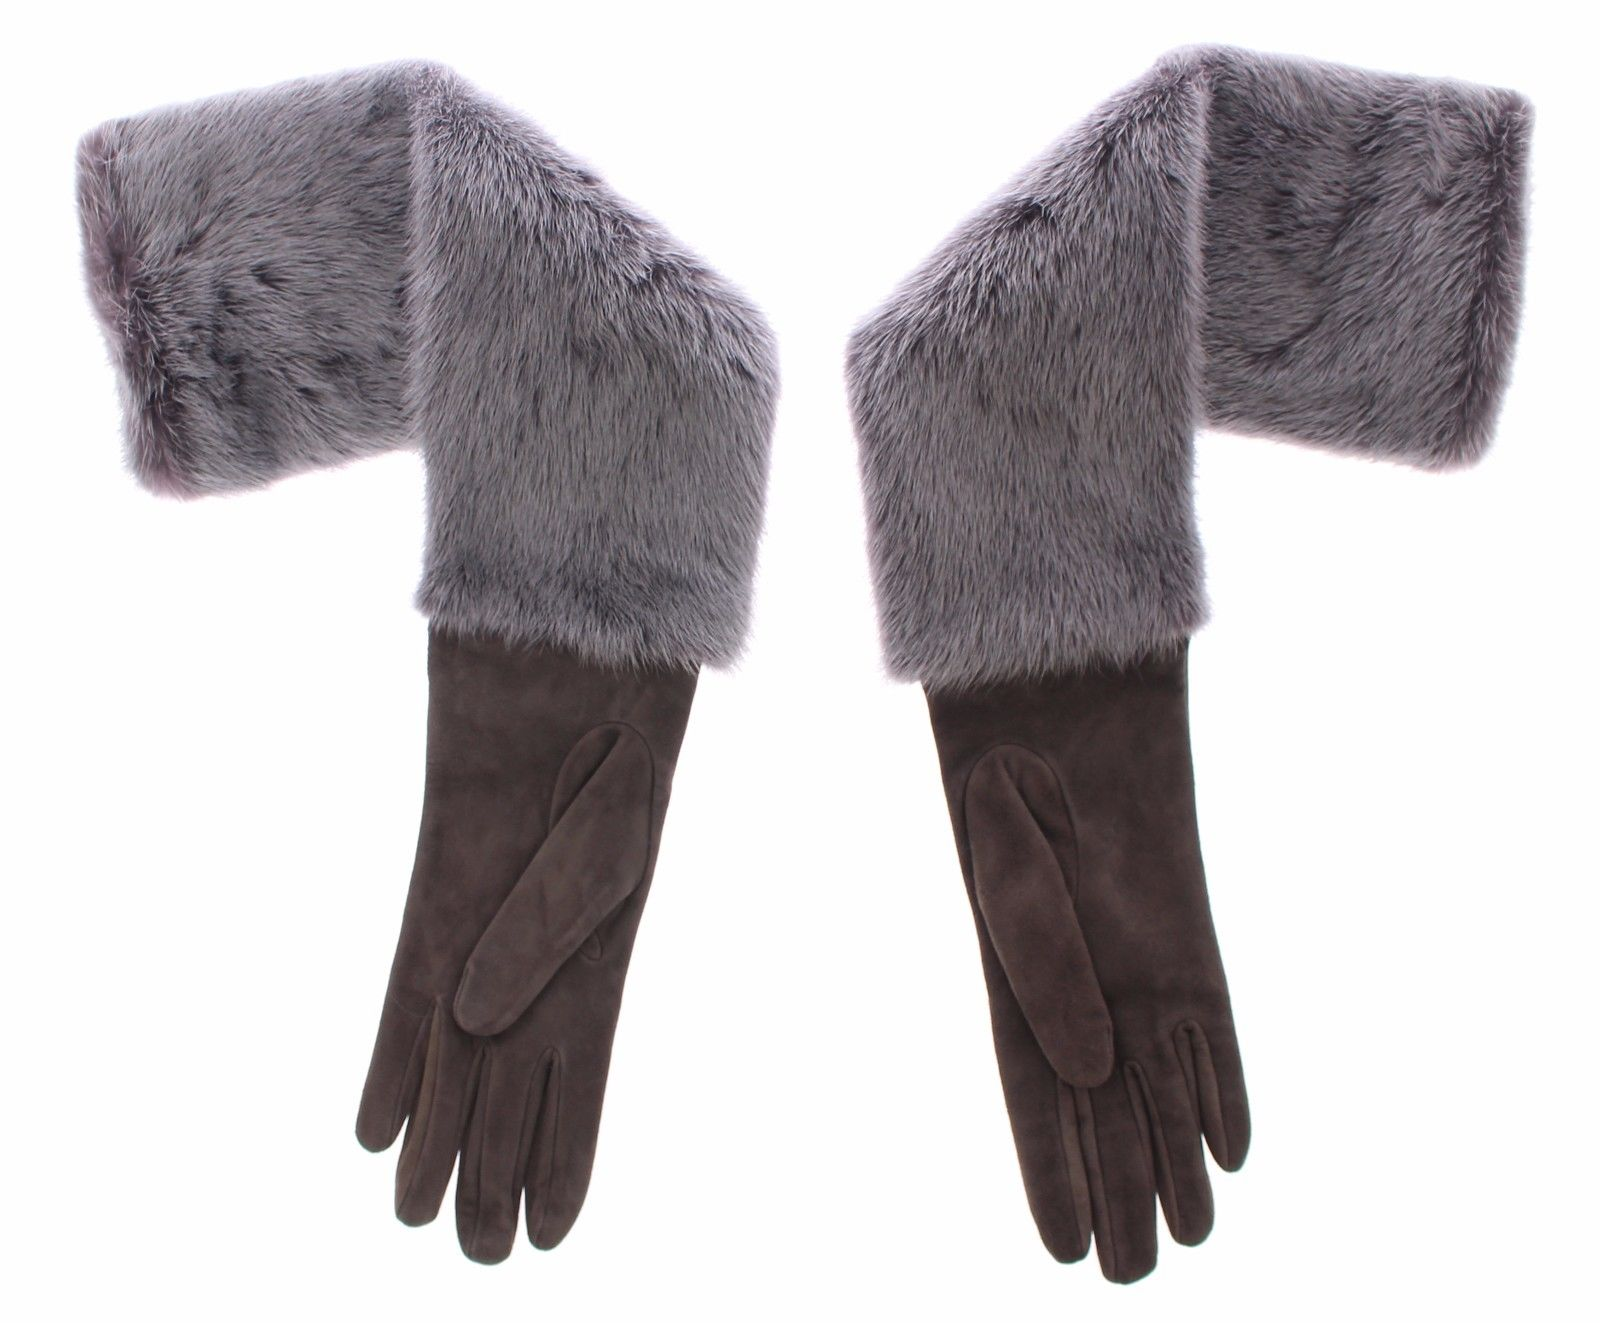 Dolce & Gabbana Women's Mink Fur Lambskin Suede Leather Gloves Gray MOM11434 - 8 | M